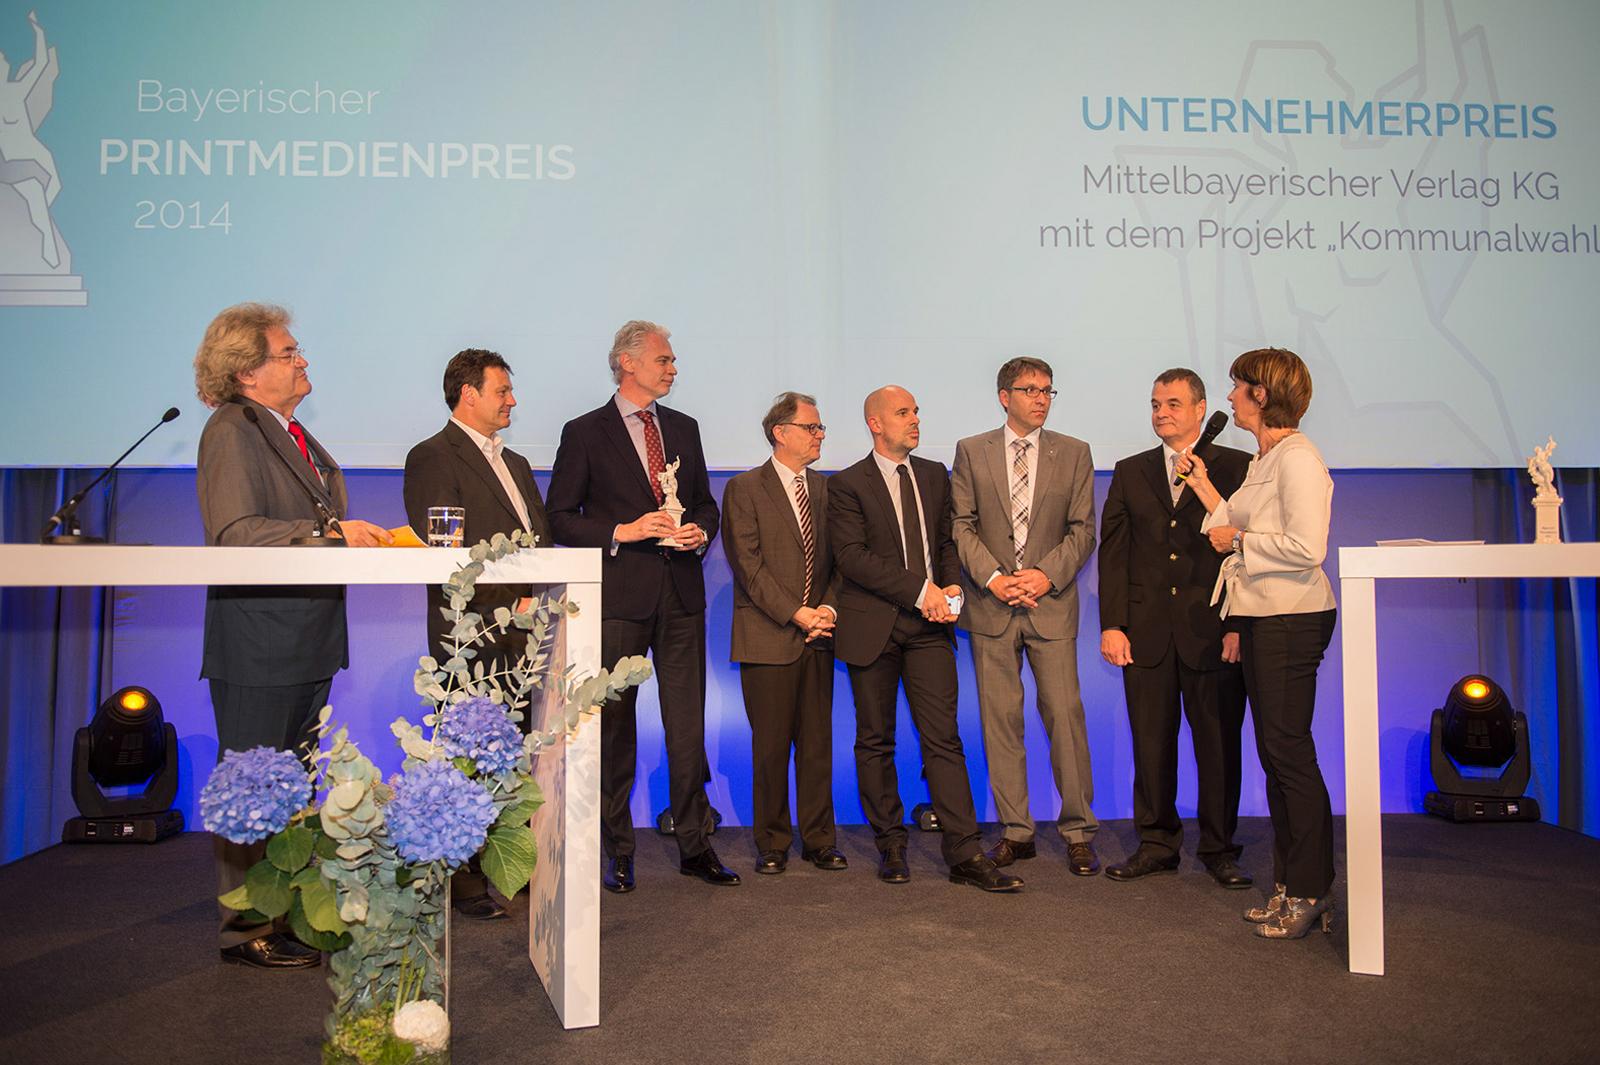 Printmedienpreis 2014 Foto: Michael Haggenmüller